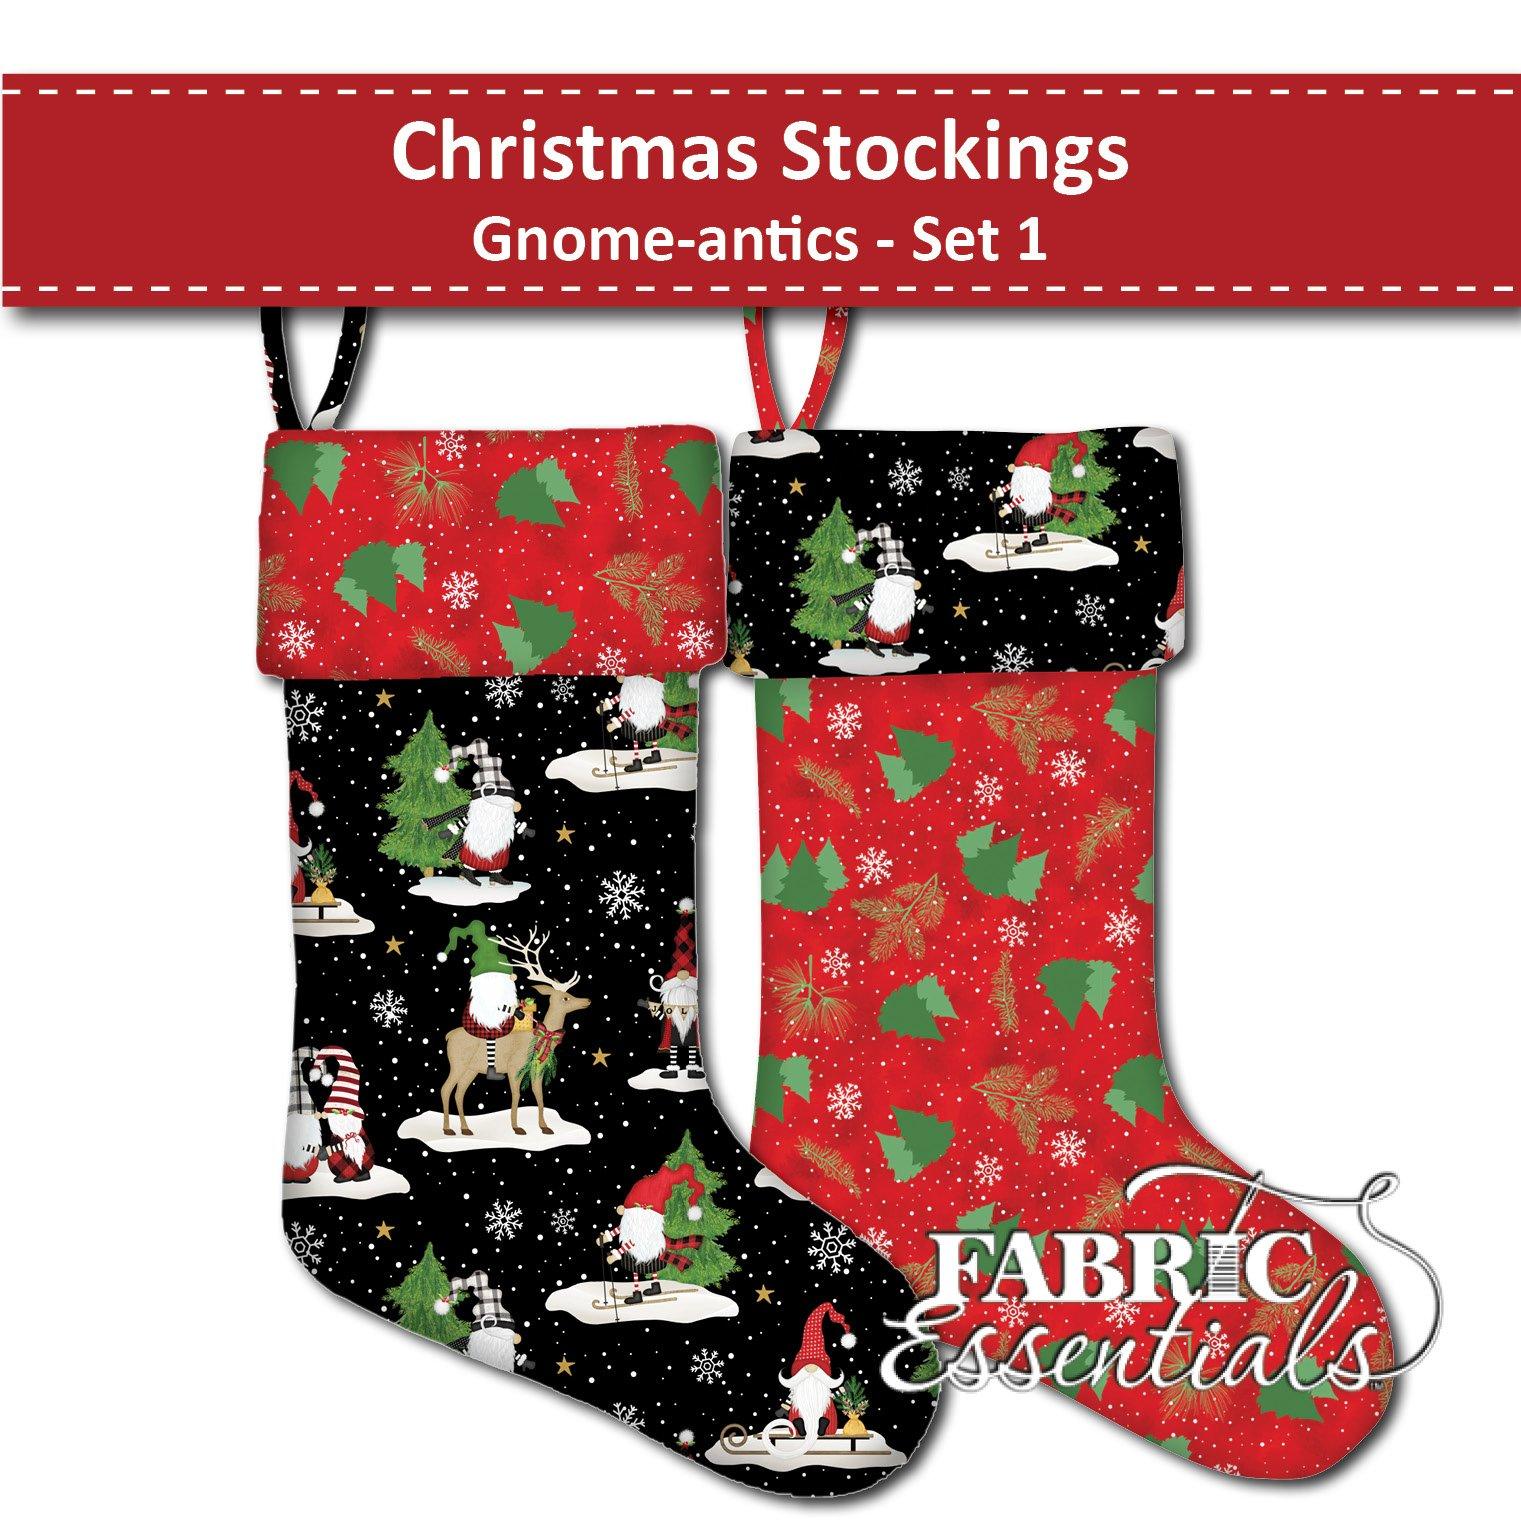 Gnome-antics - Christmas Stockings - Set 1